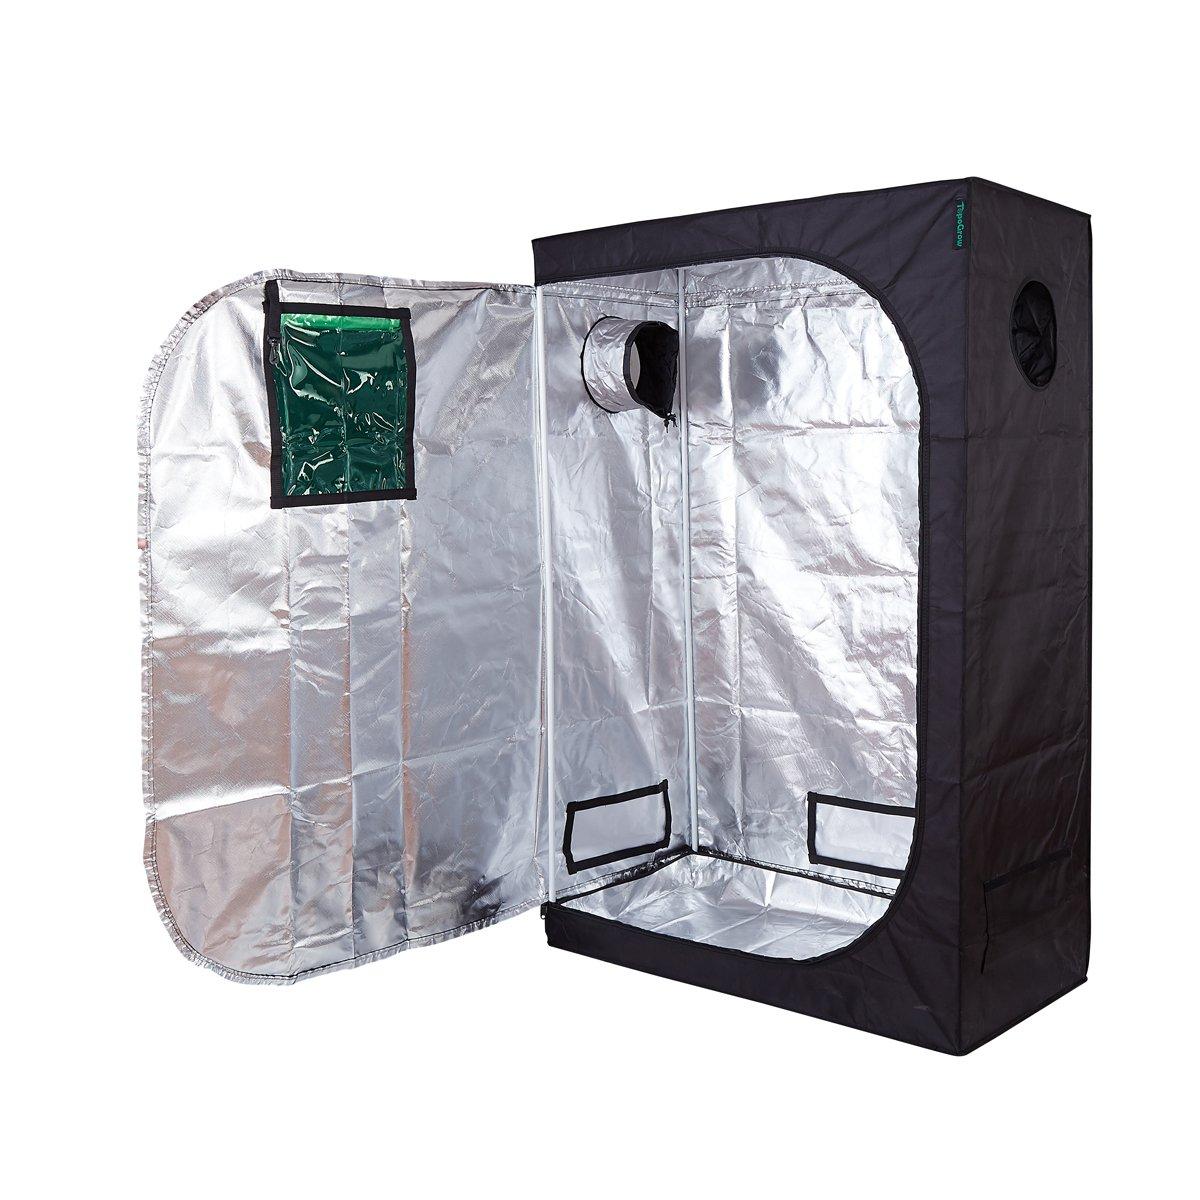 TopoGrow 48''X24''X72'' Indoor Tent Room Reflective Mylar Hydroponic Non Grow Toxic Hut W/Metal Corners&Green Window